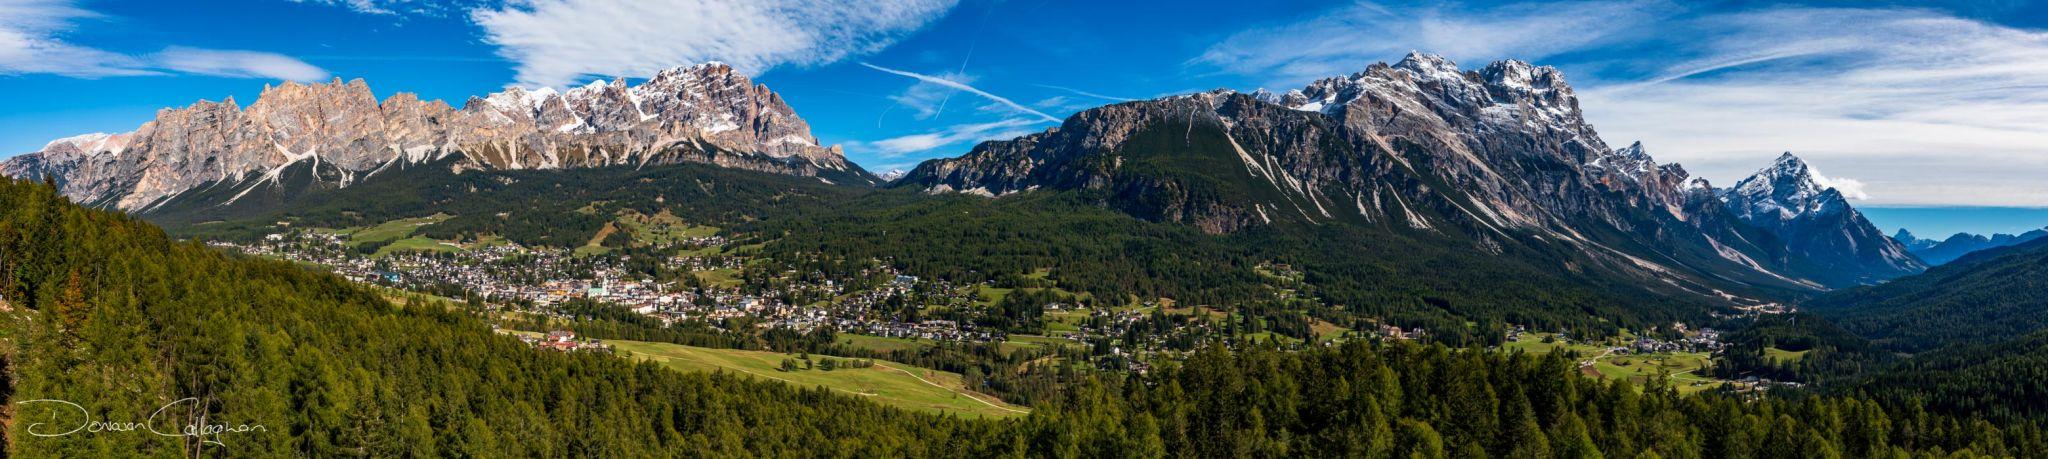 Cortina d'Ampezzo panorama Dolomites, Italy